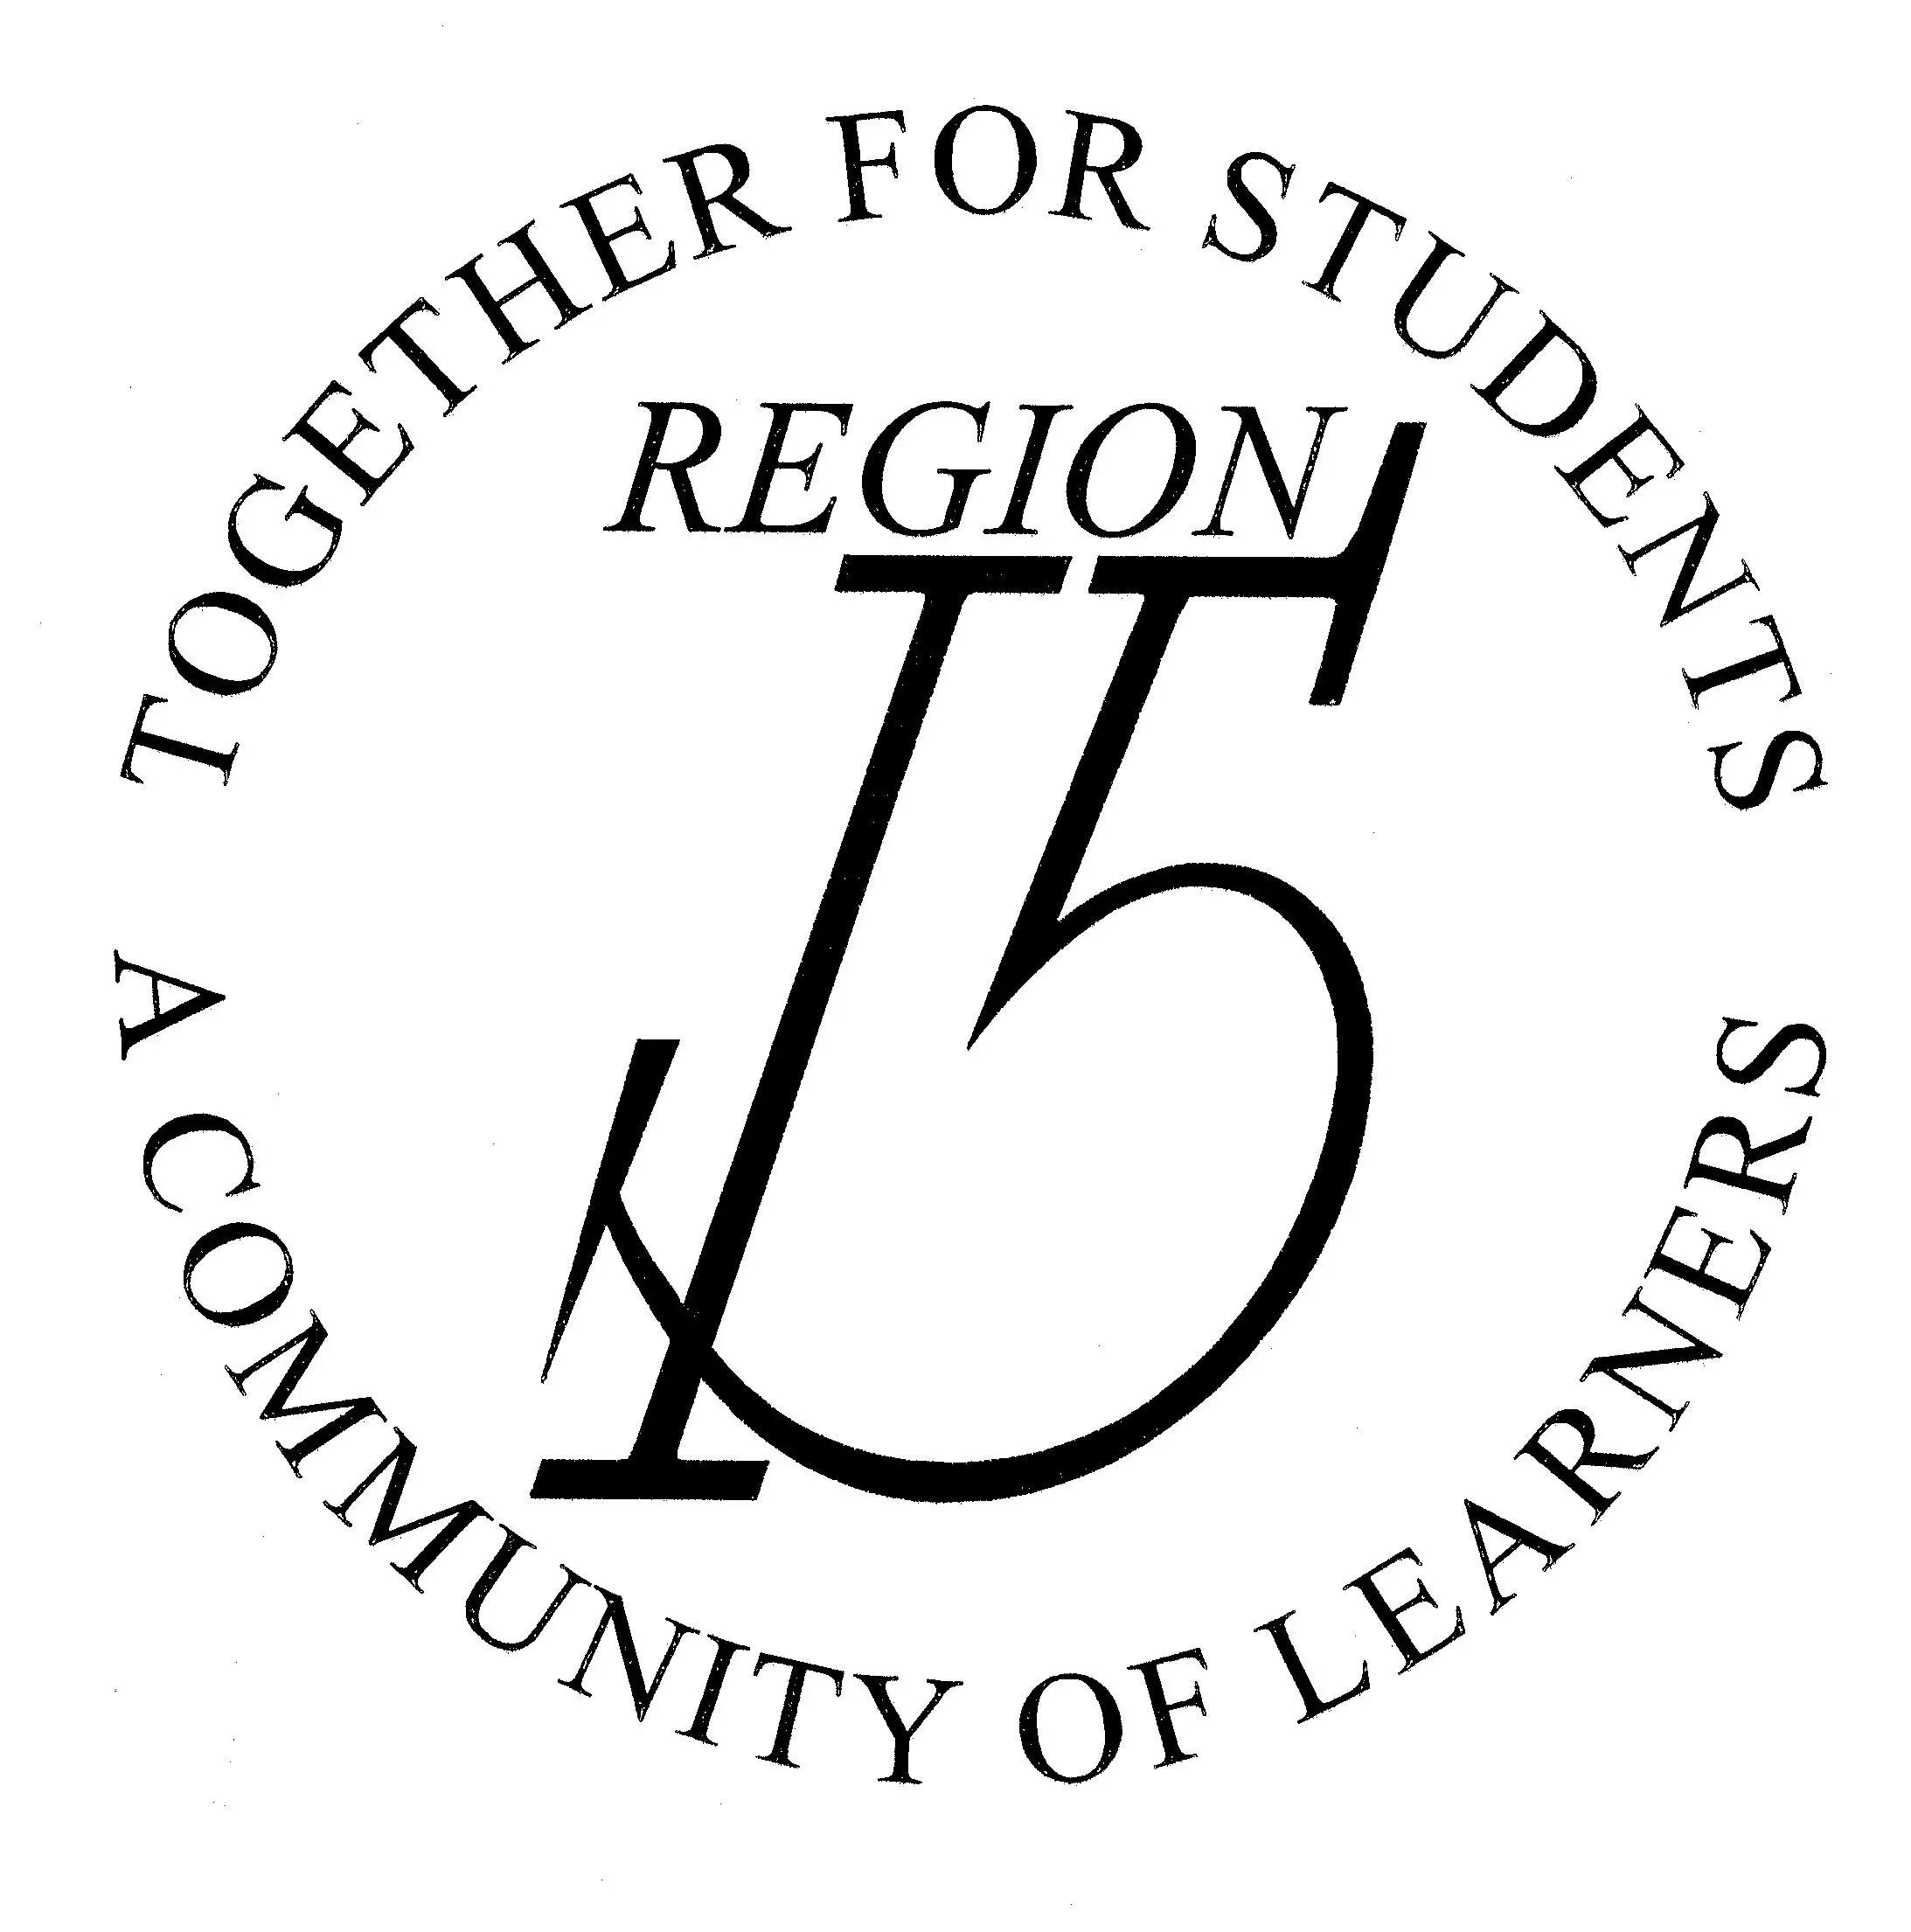 Region 15 Seeks Teacher of the Year Nominations